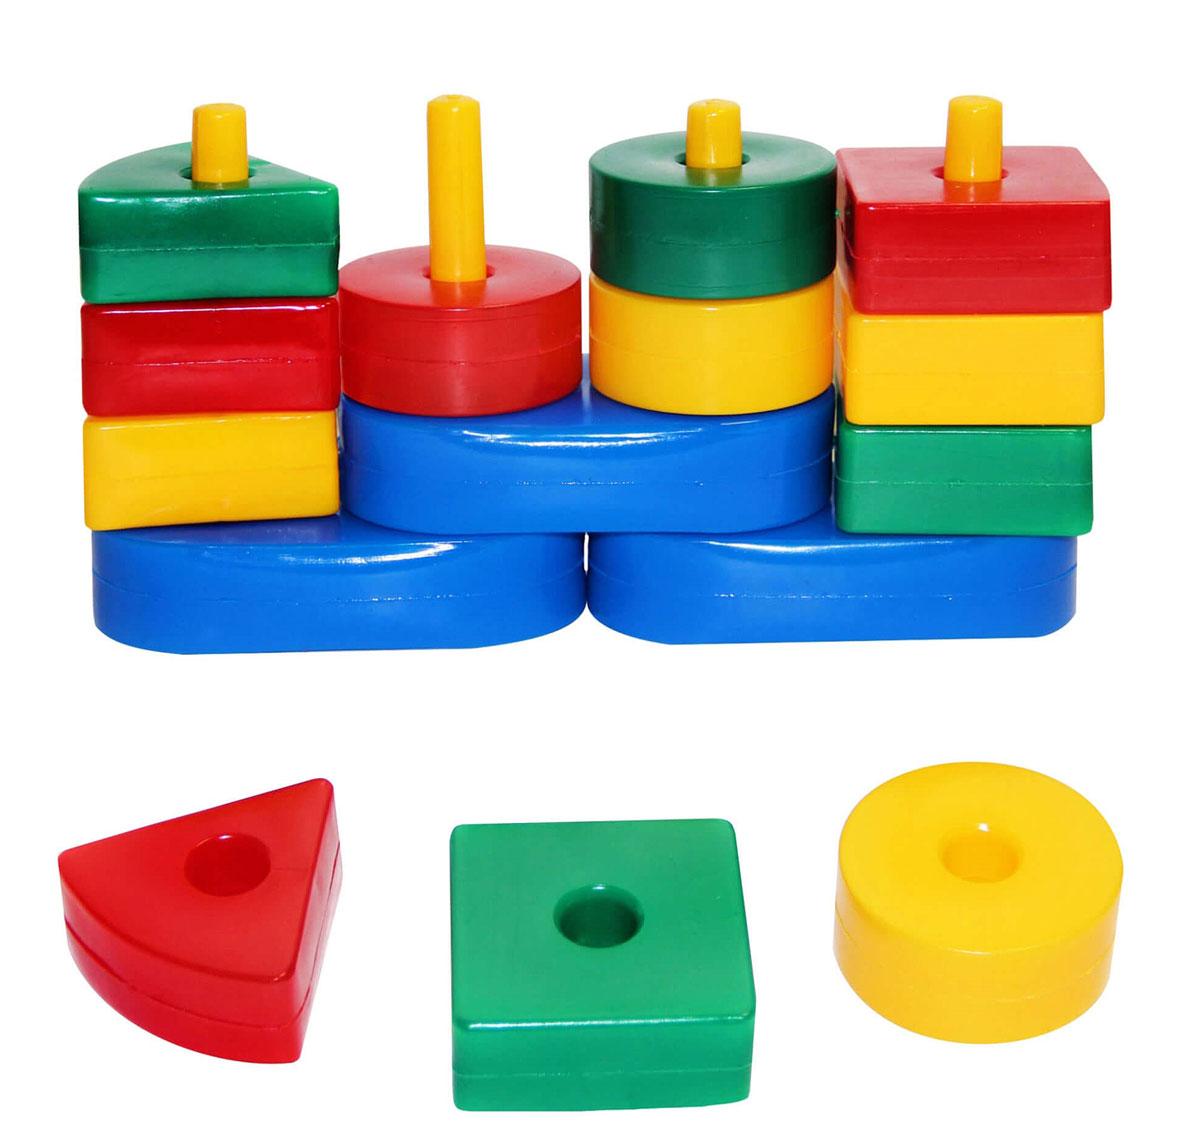 Строим вместе счастливое детство Сортер Логическая горка счастливое детство качалка квадрат